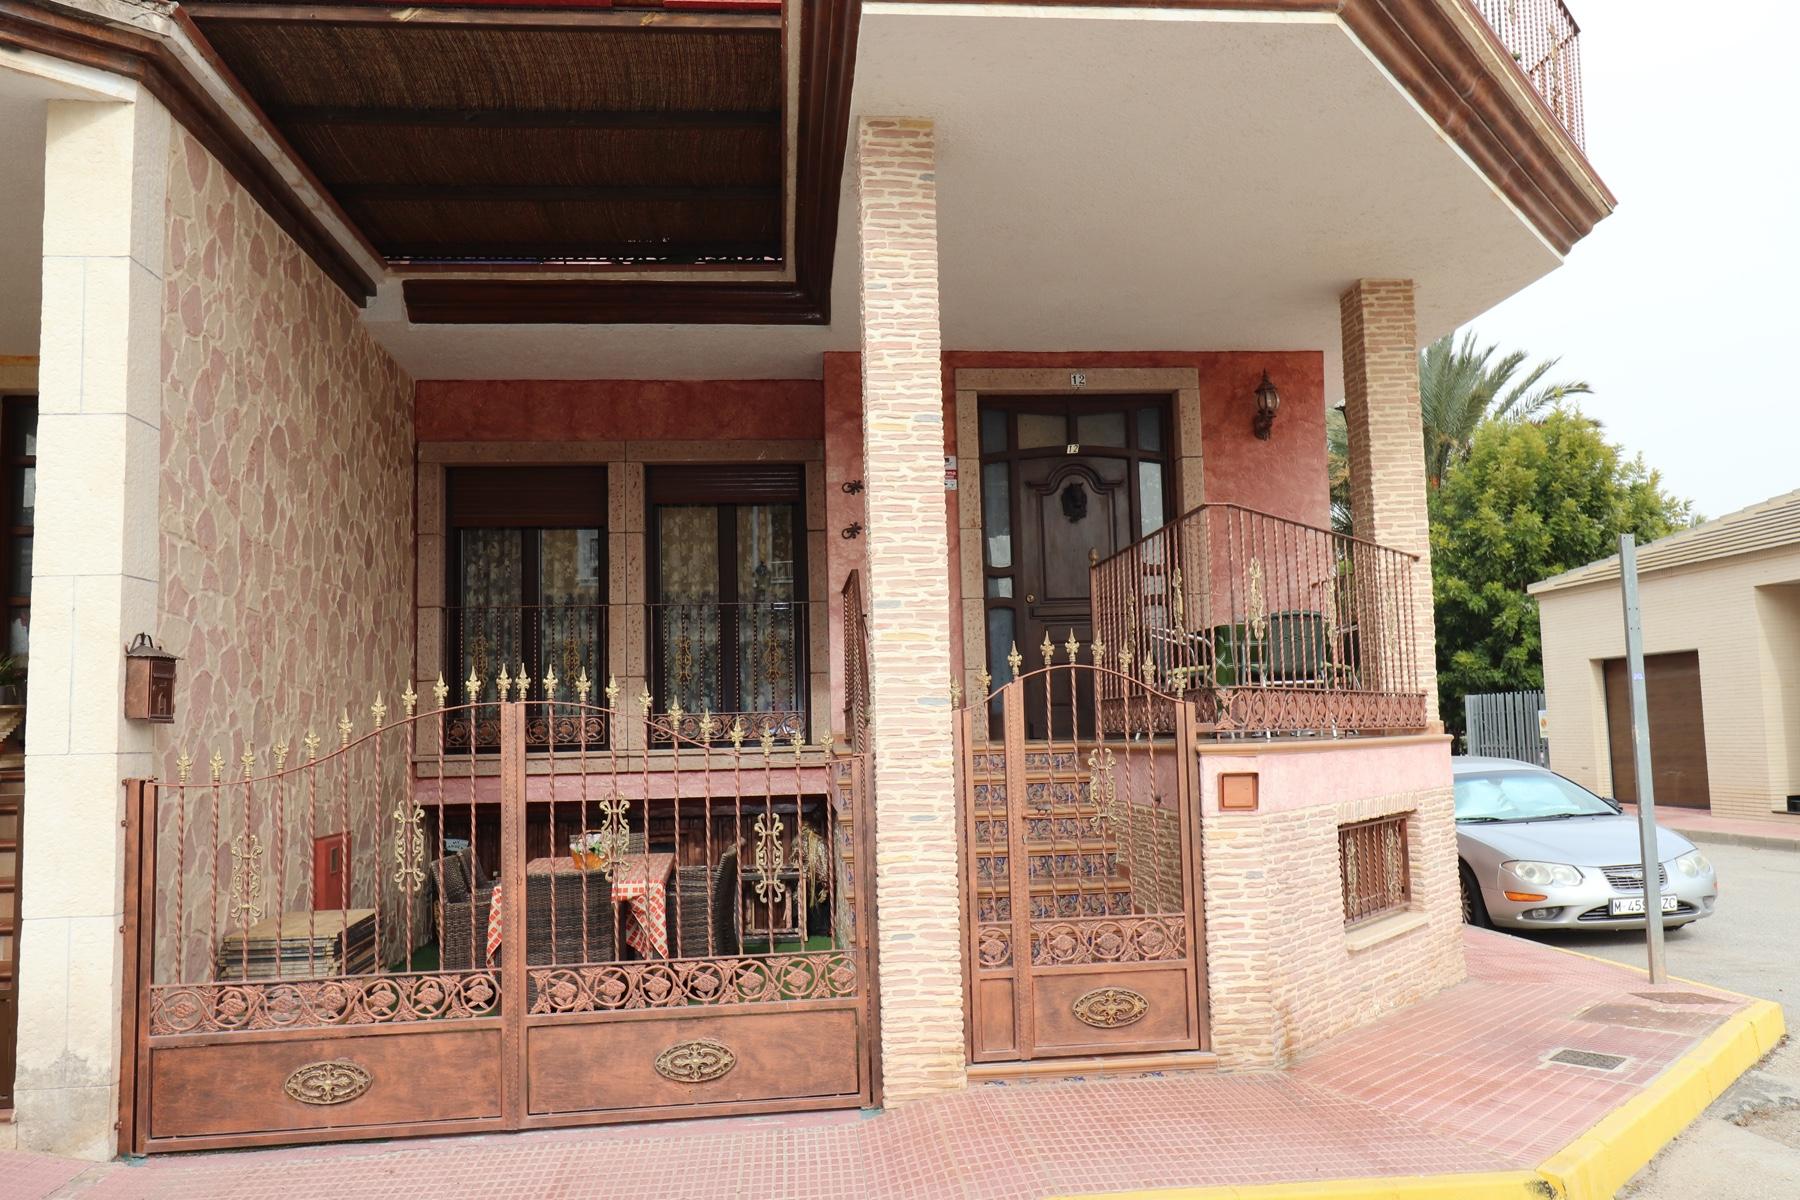 PCE-1253: Villa for sale in Daya Nueva